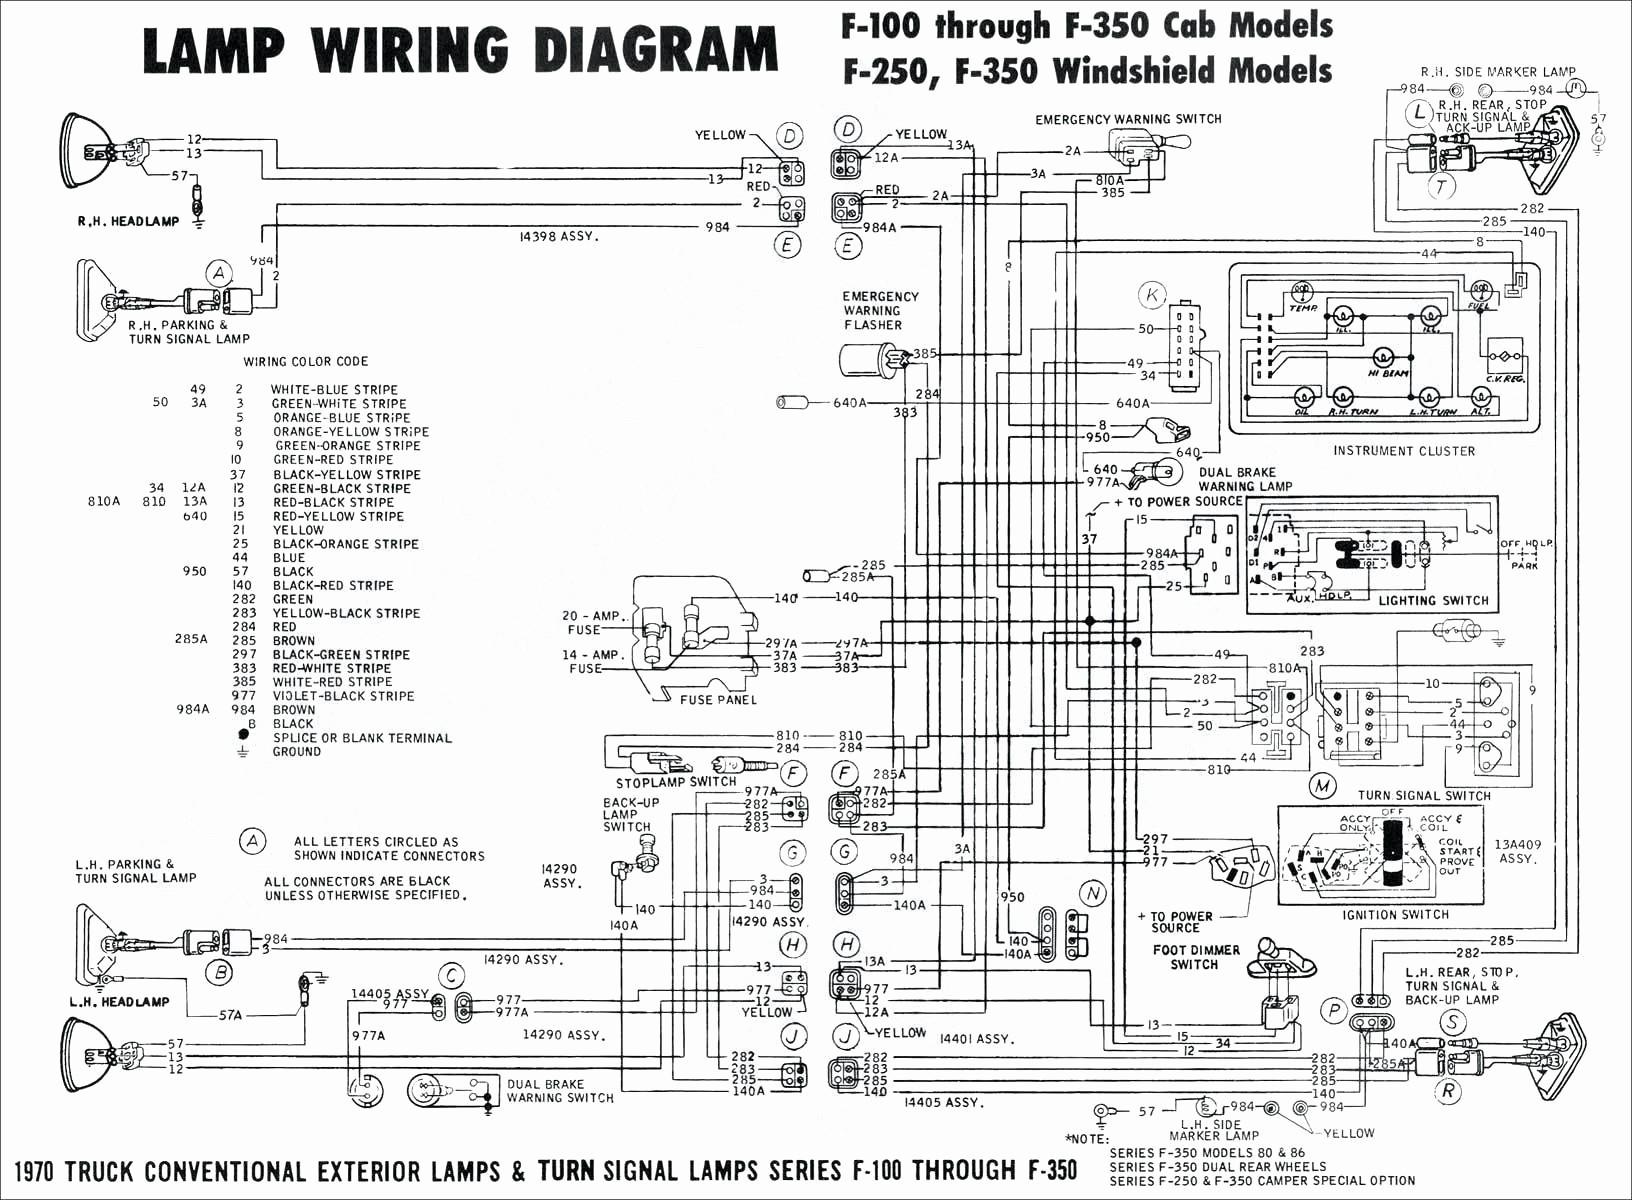 E46 Wiring Diagram Pdf